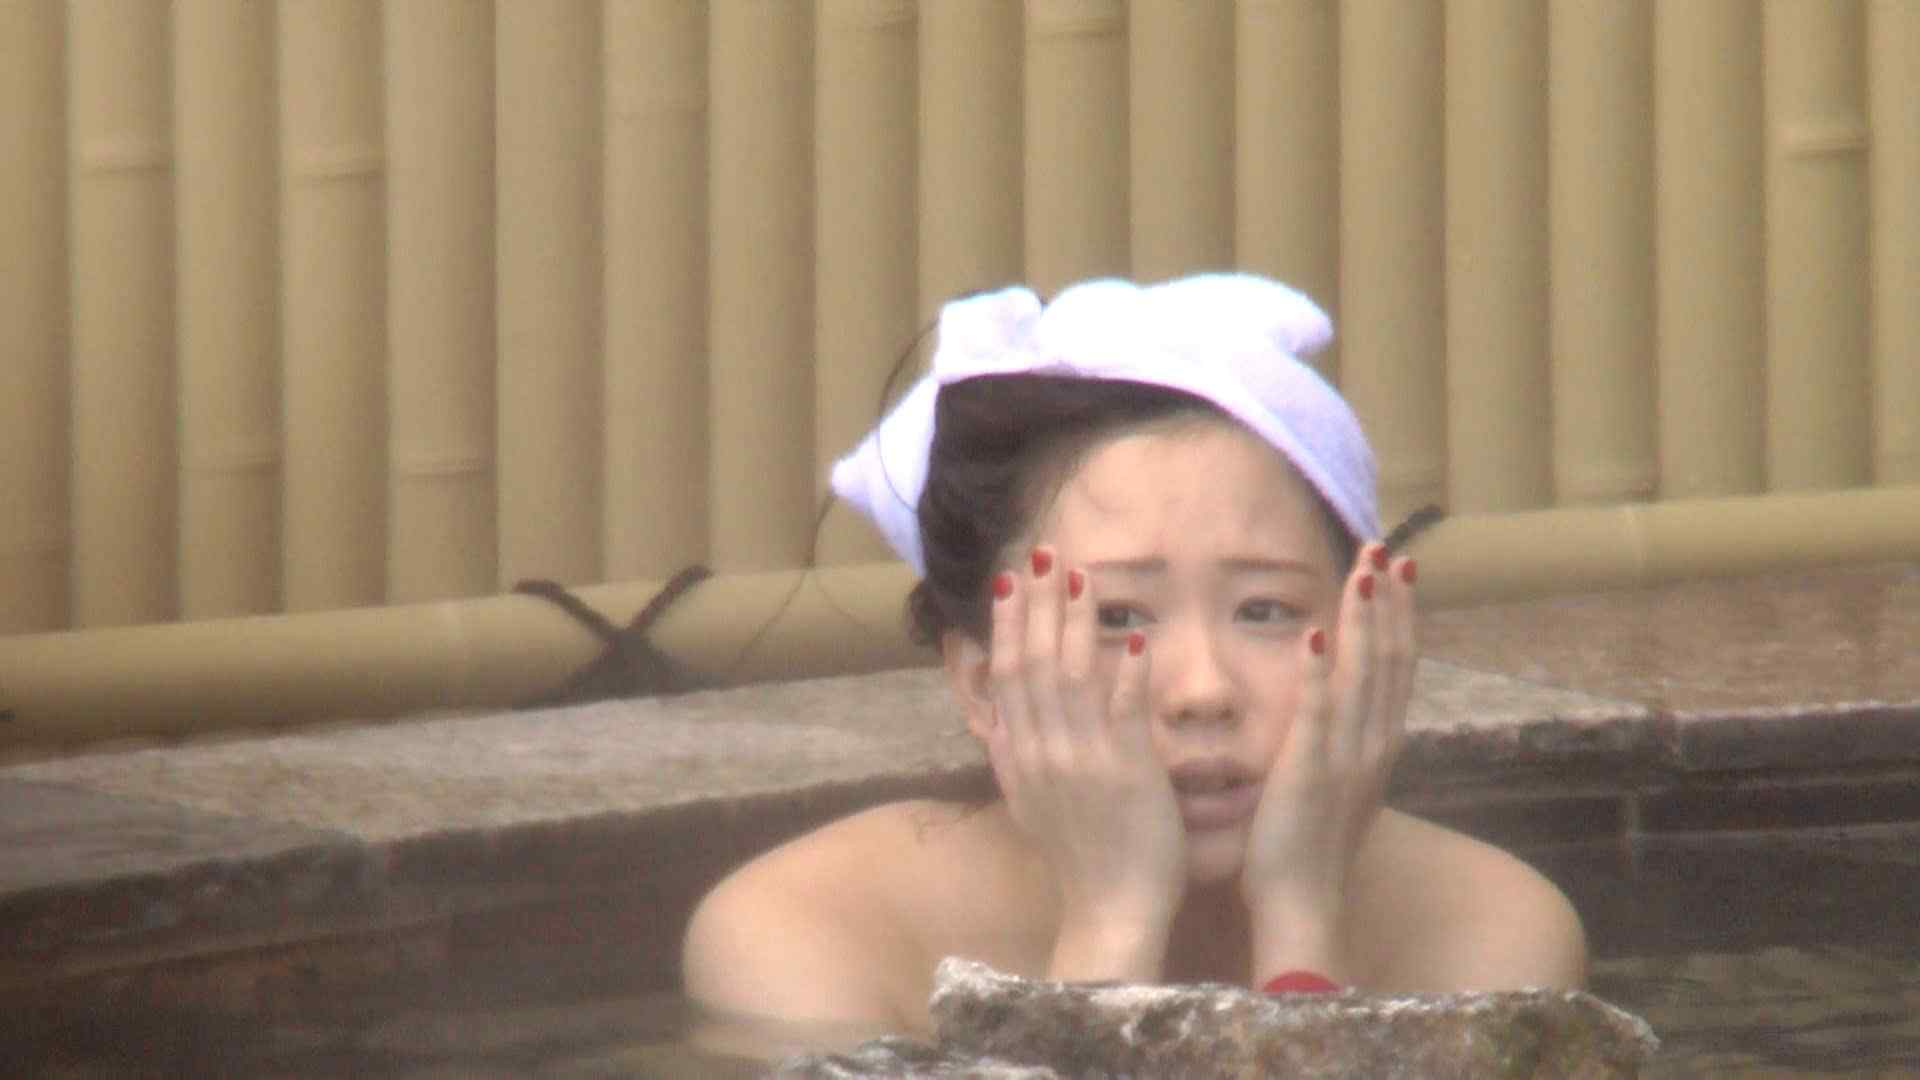 Aquaな露天風呂Vol.211 OLセックス 盗撮アダルト動画キャプチャ 68画像 68